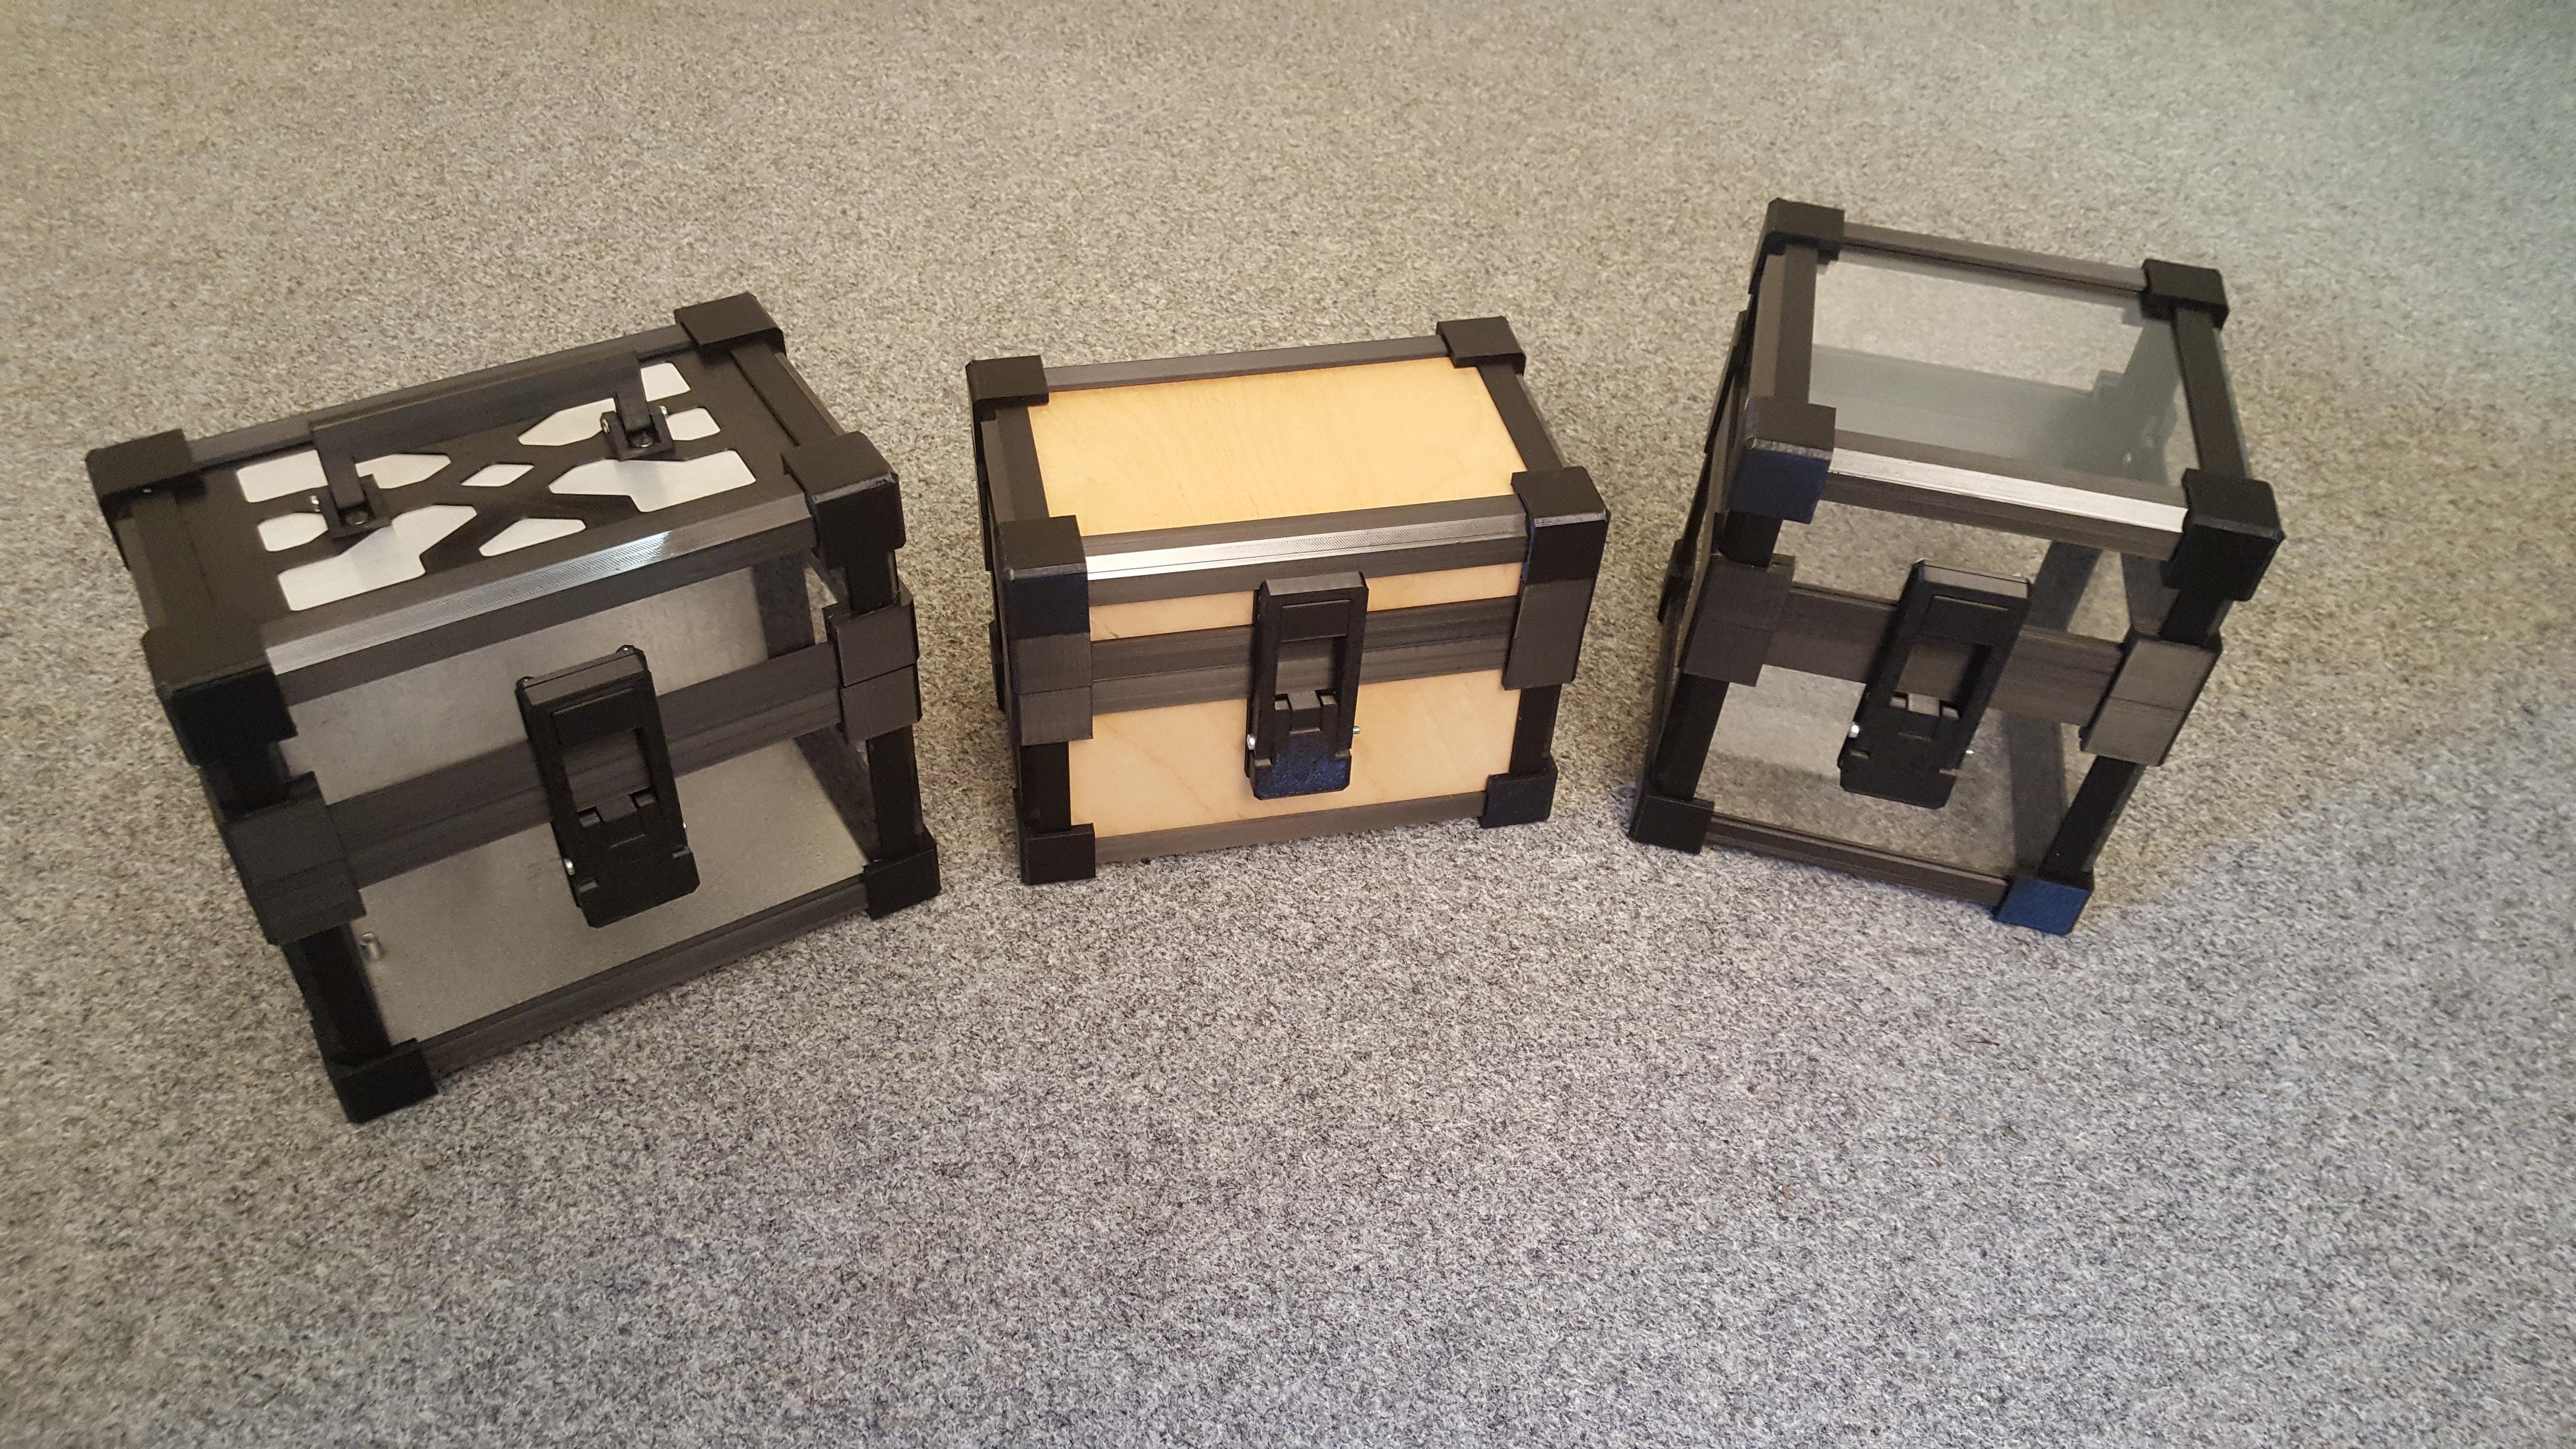 20190818_165116.jpg Download STL file LazyMans Box • Model to 3D print, Job